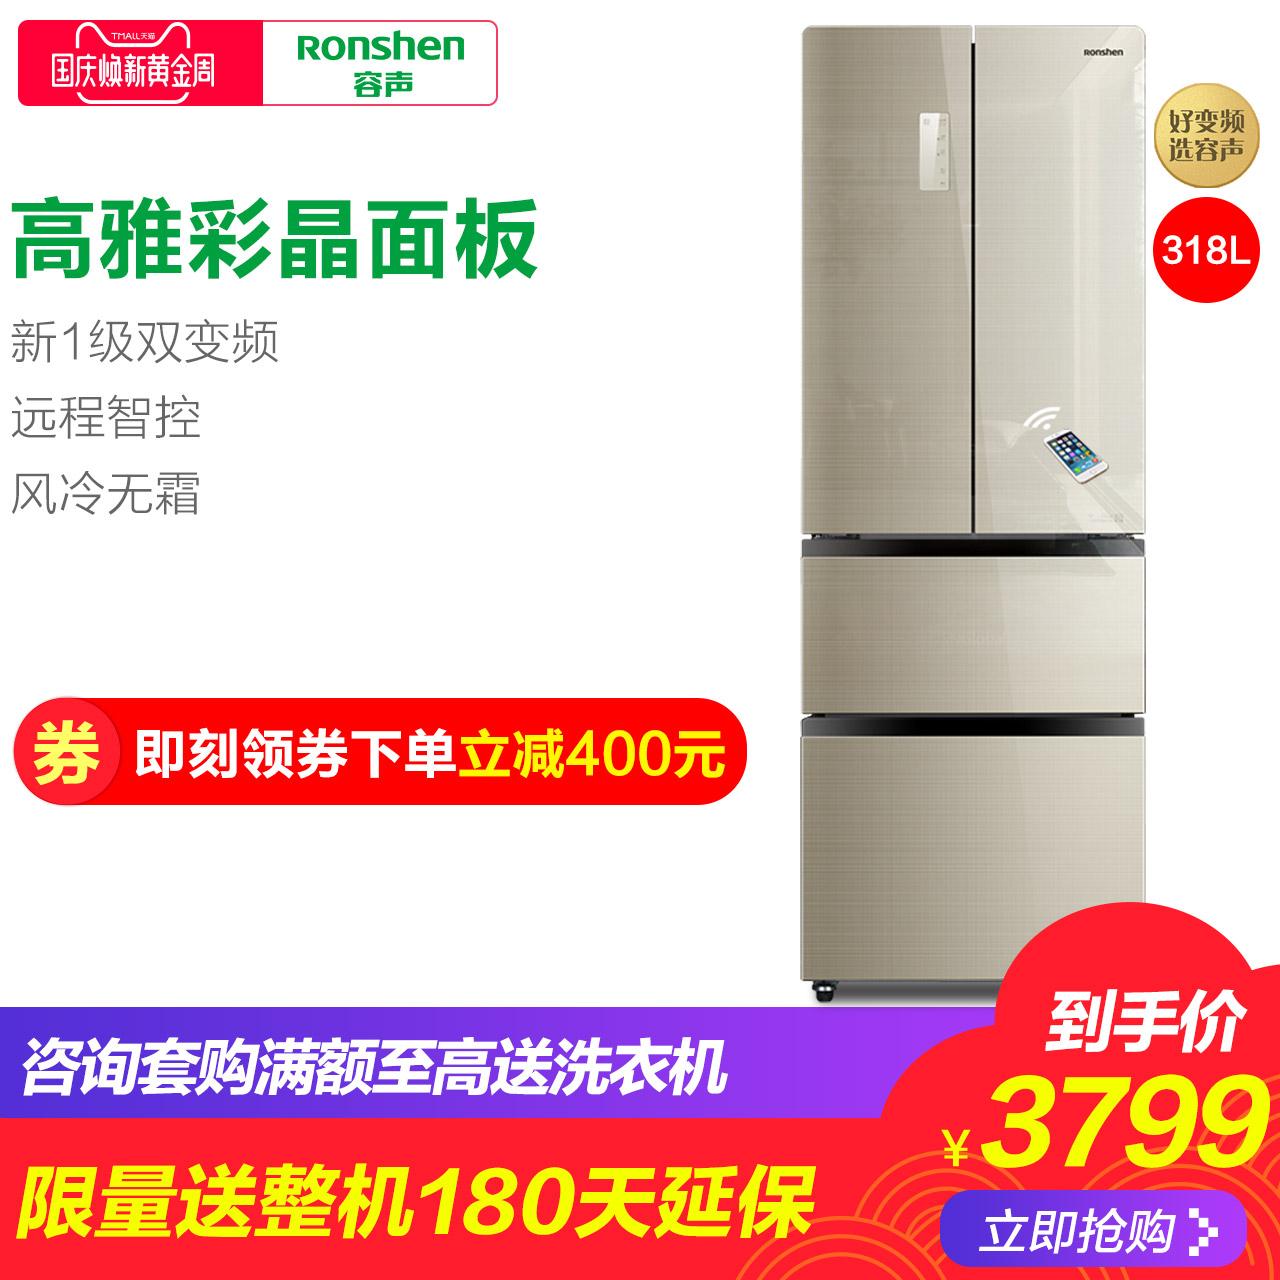 Ronshen-容声 BCD-318WD11MPAC多门冰箱四开门风冷无霜家用一级